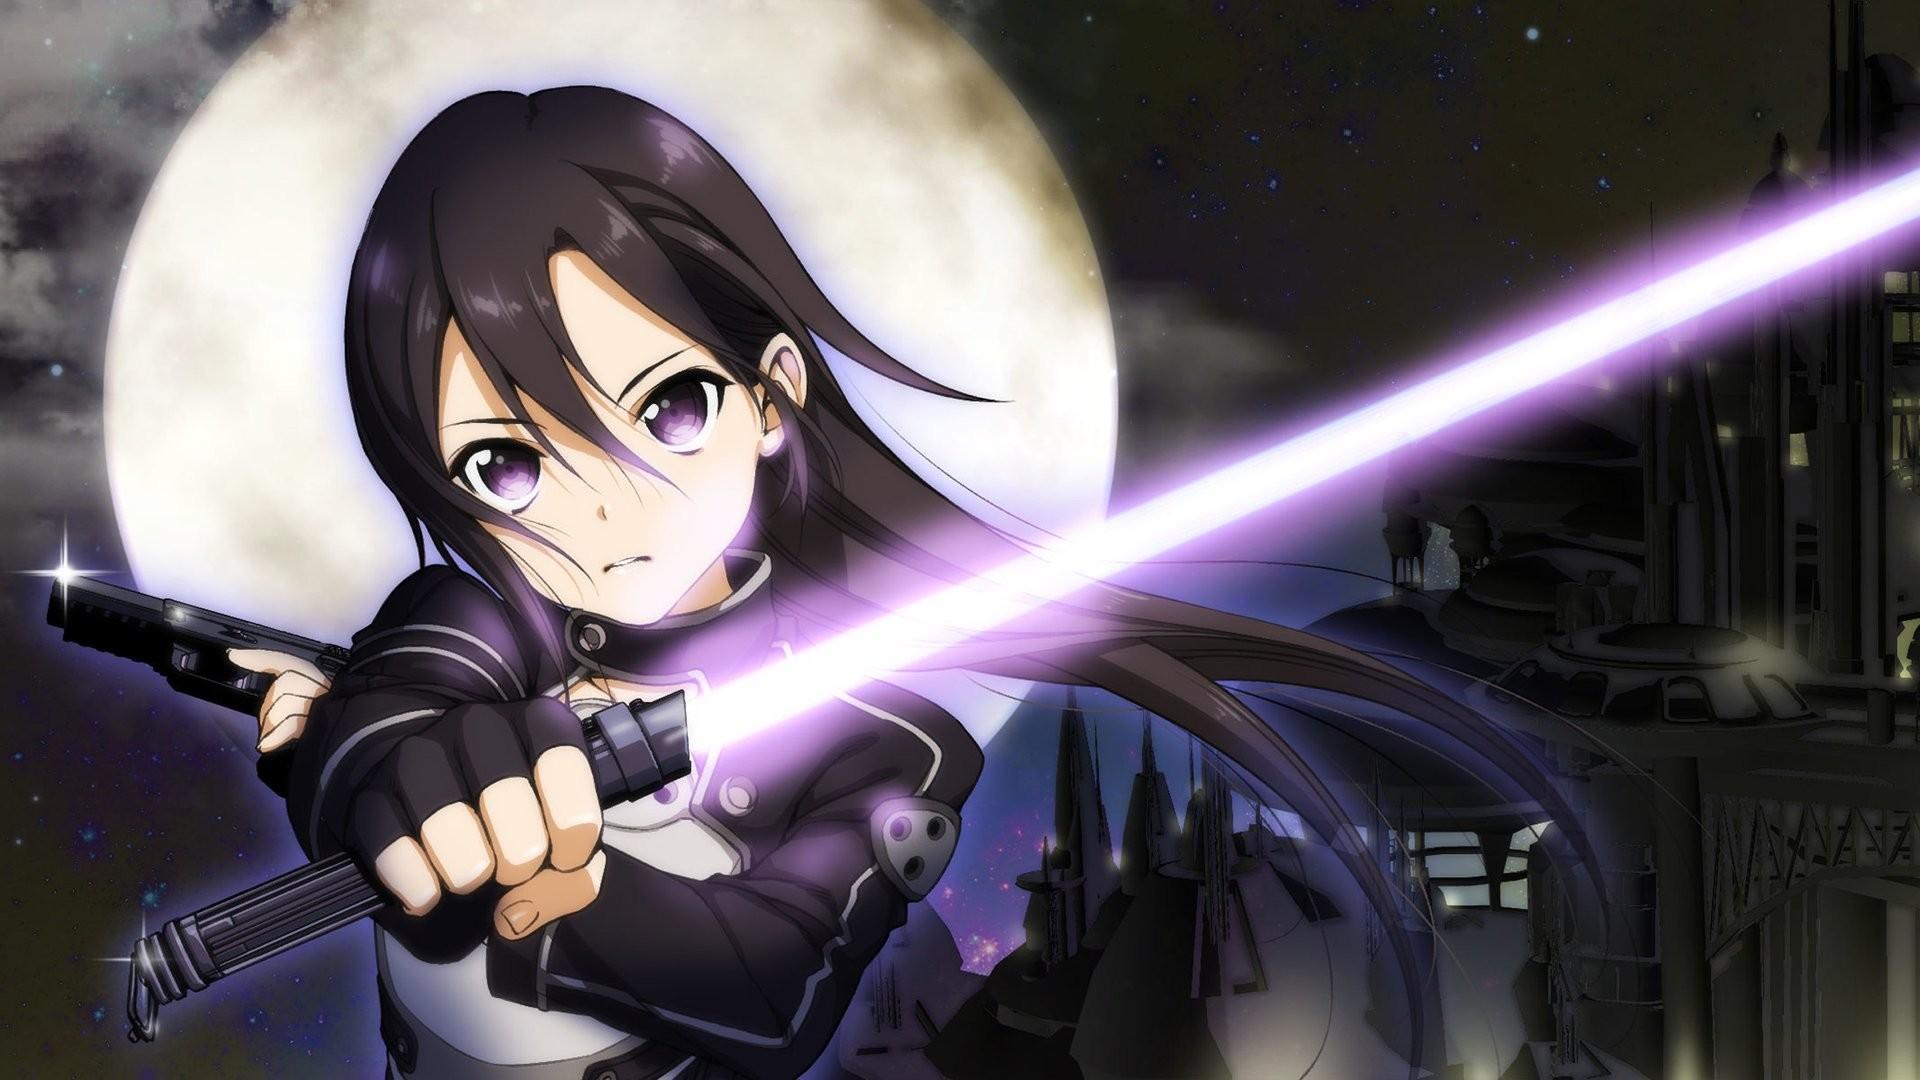 SWORD ART ONLINE II animation fighting sci-fi japanese anime 1saoll fantasy  warrior wallpaper | | 626108 | WallpaperUP